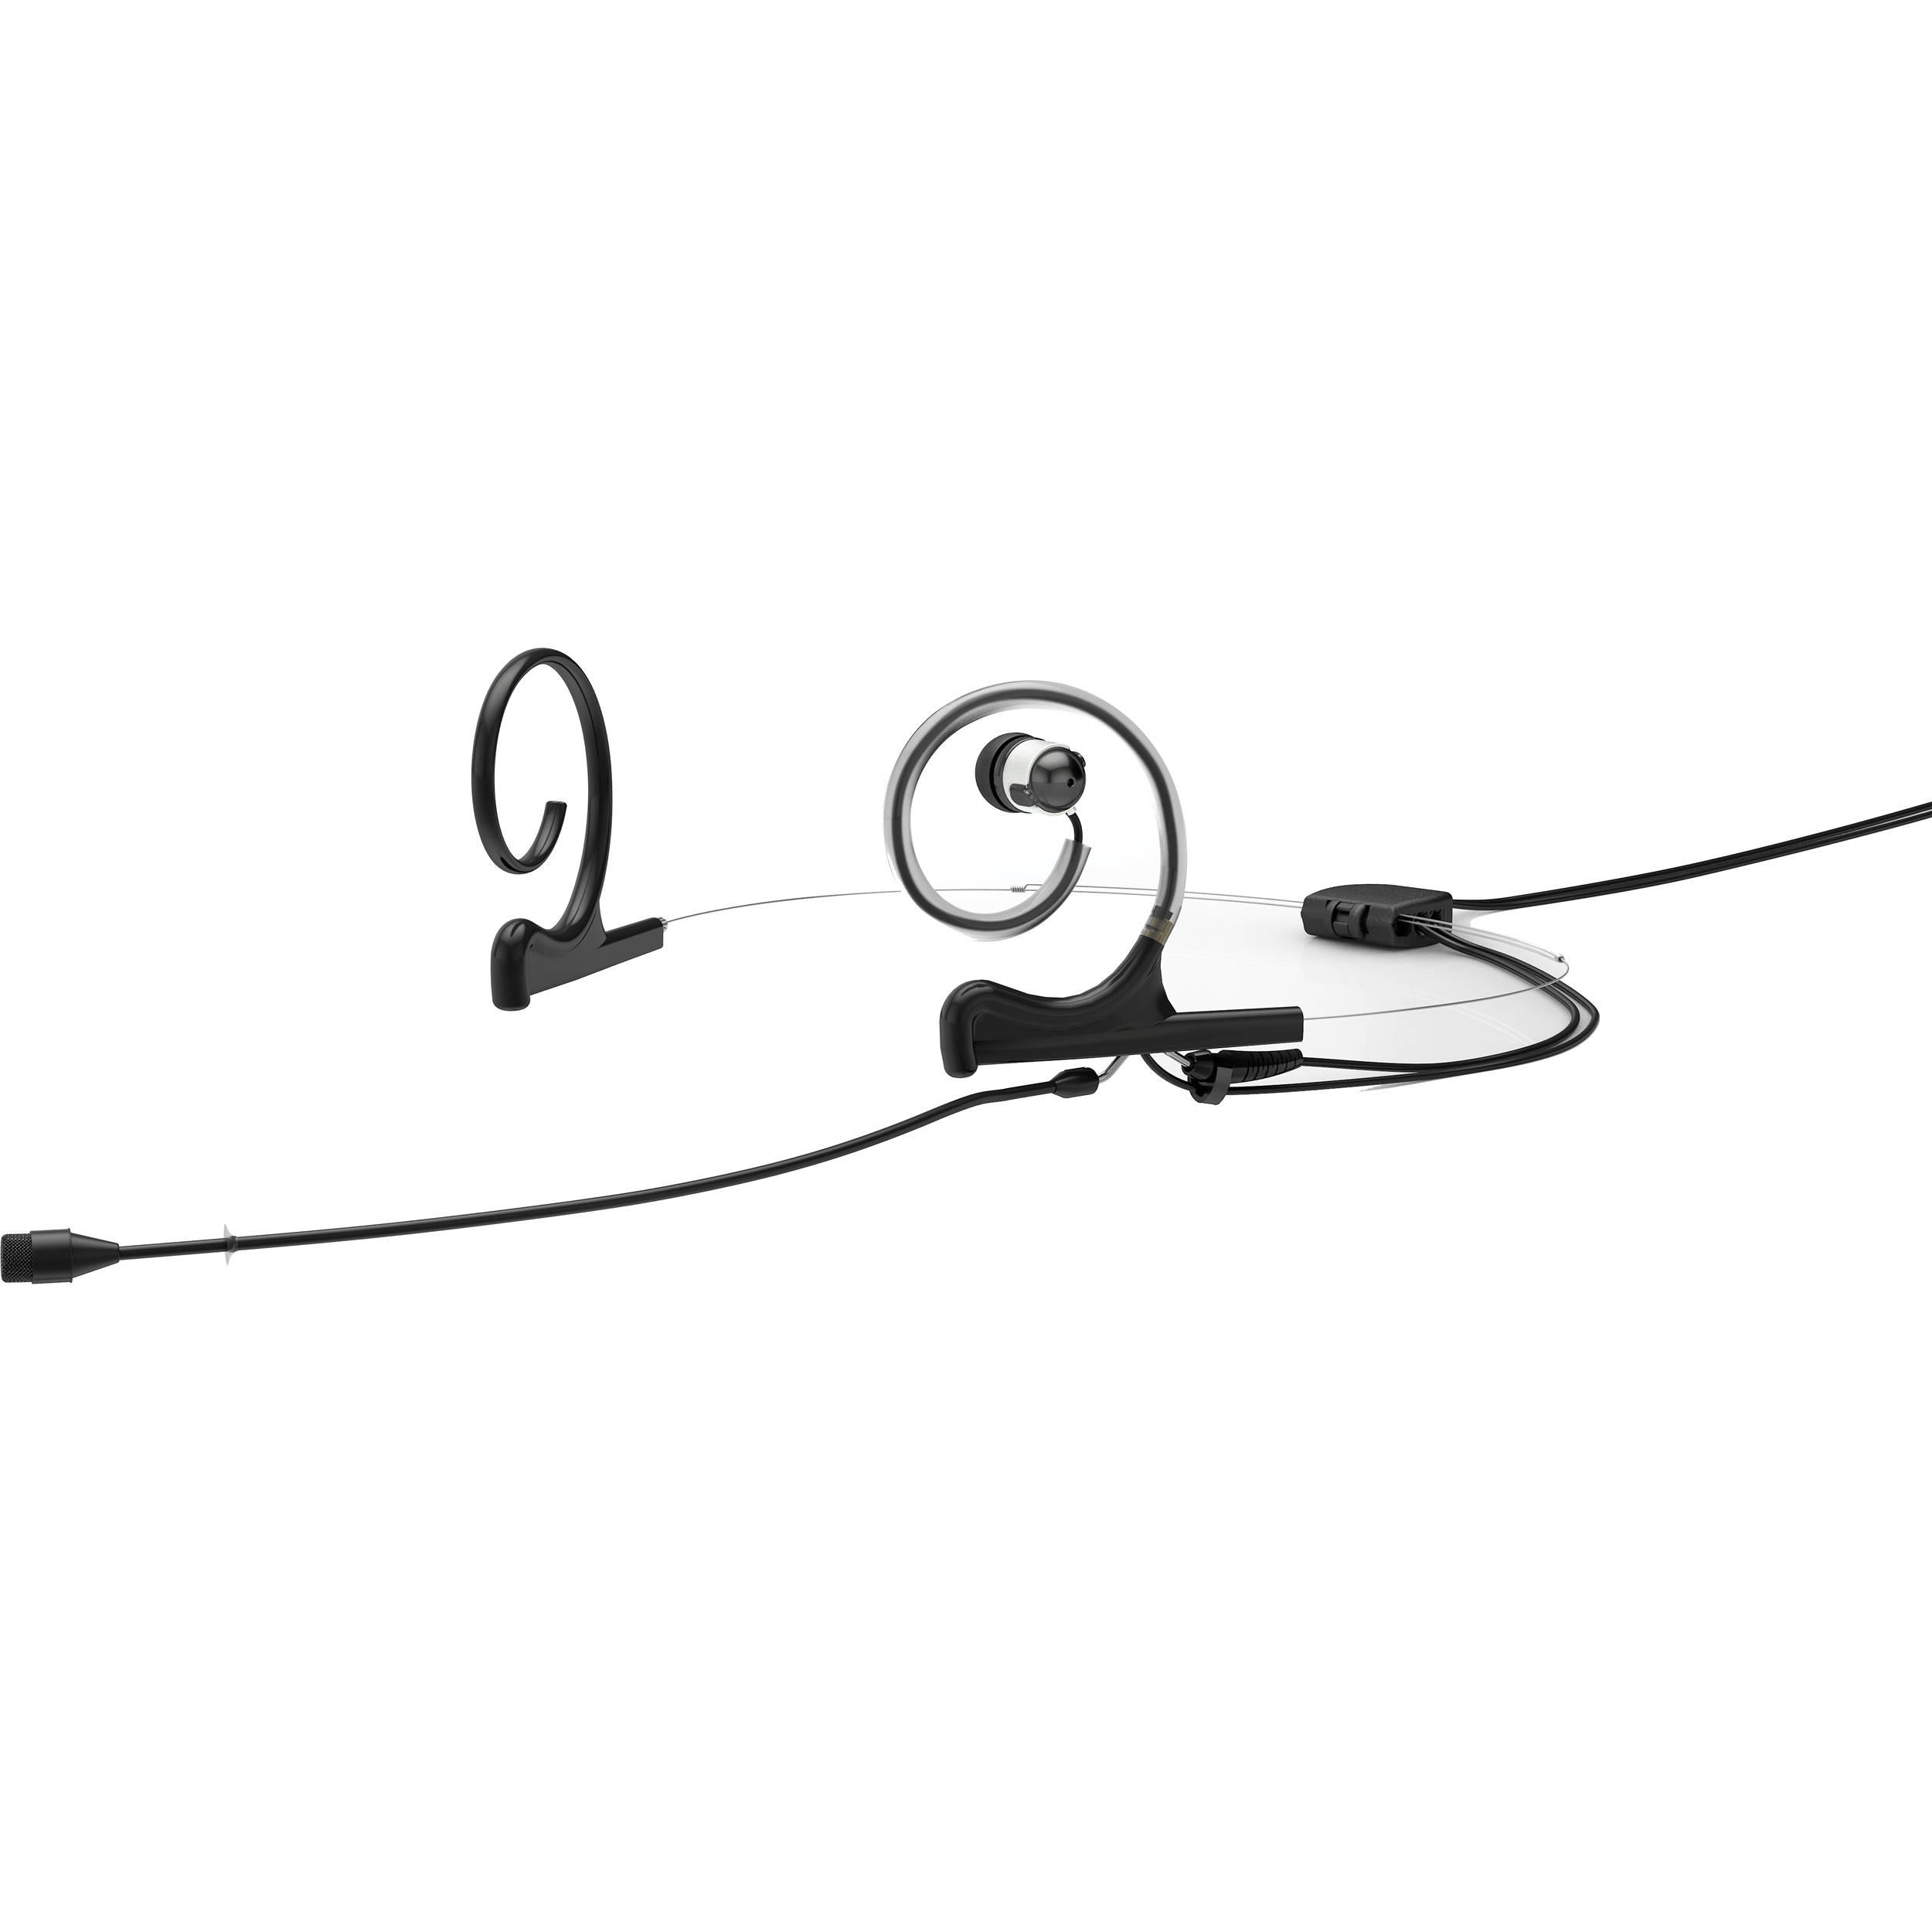 Dpa Microphones D Fine Omni In Ear Fio66ba56 2 Ie1 B B Amp H